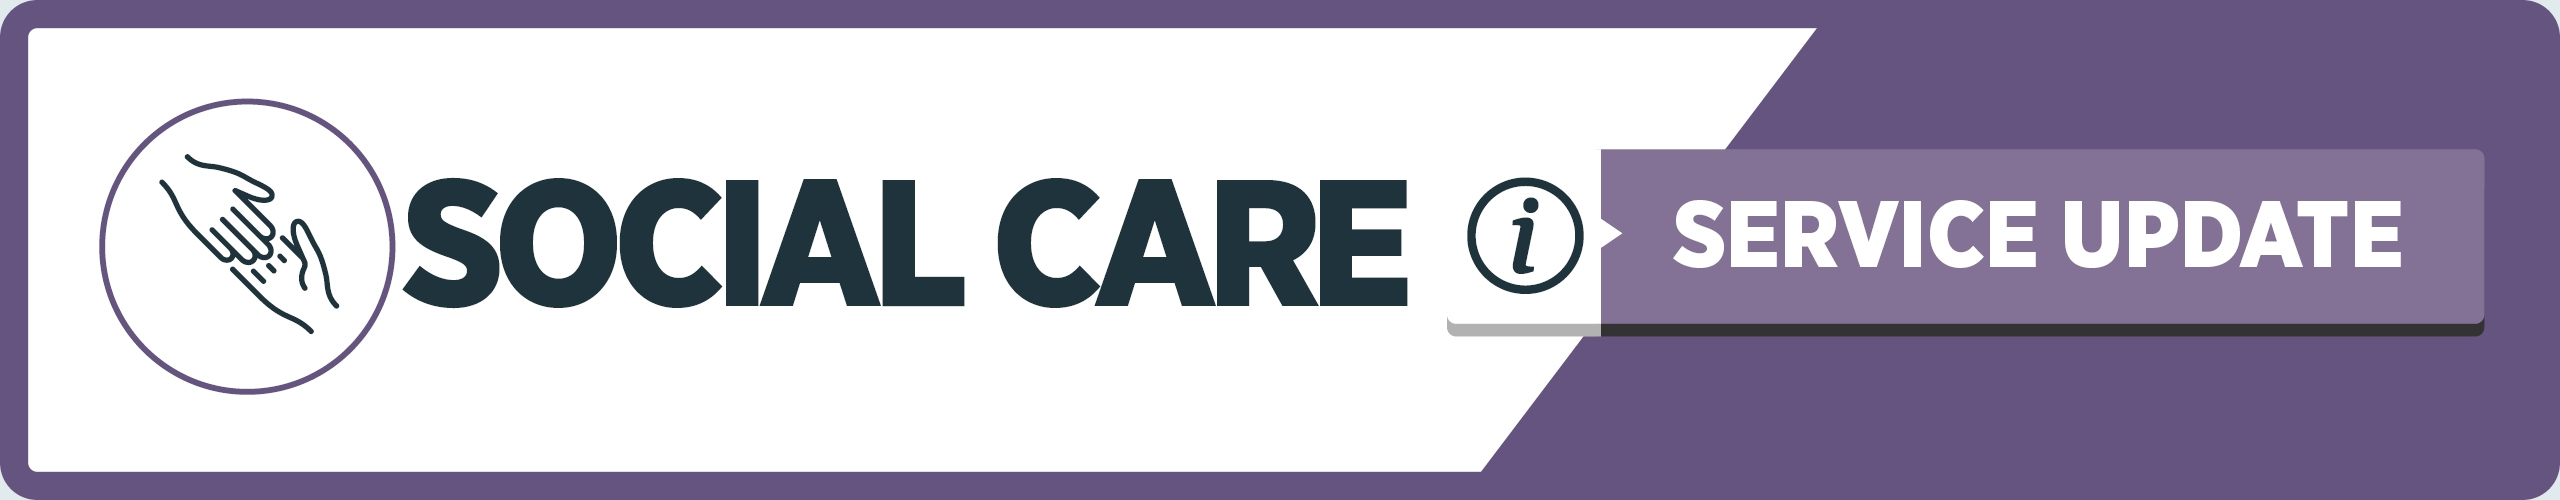 Social Care Updates